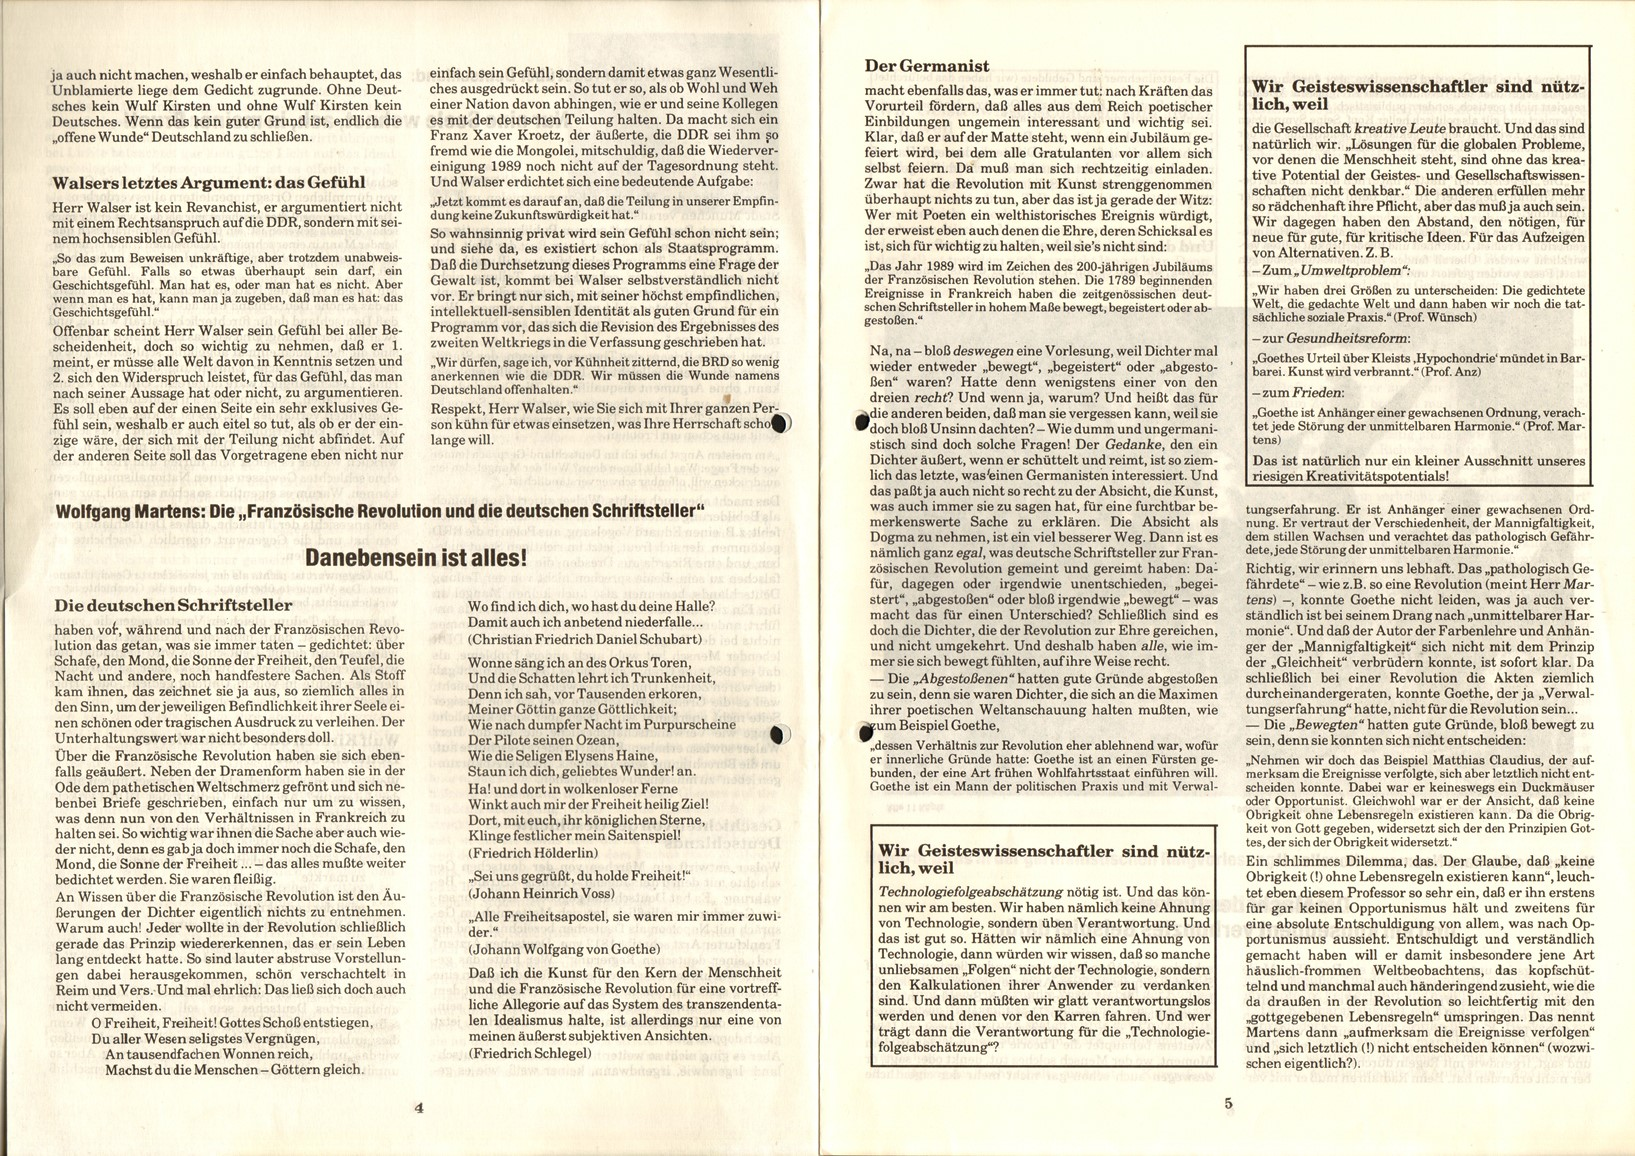 Muenchen_MG_FB_Germanistik_19881001_03